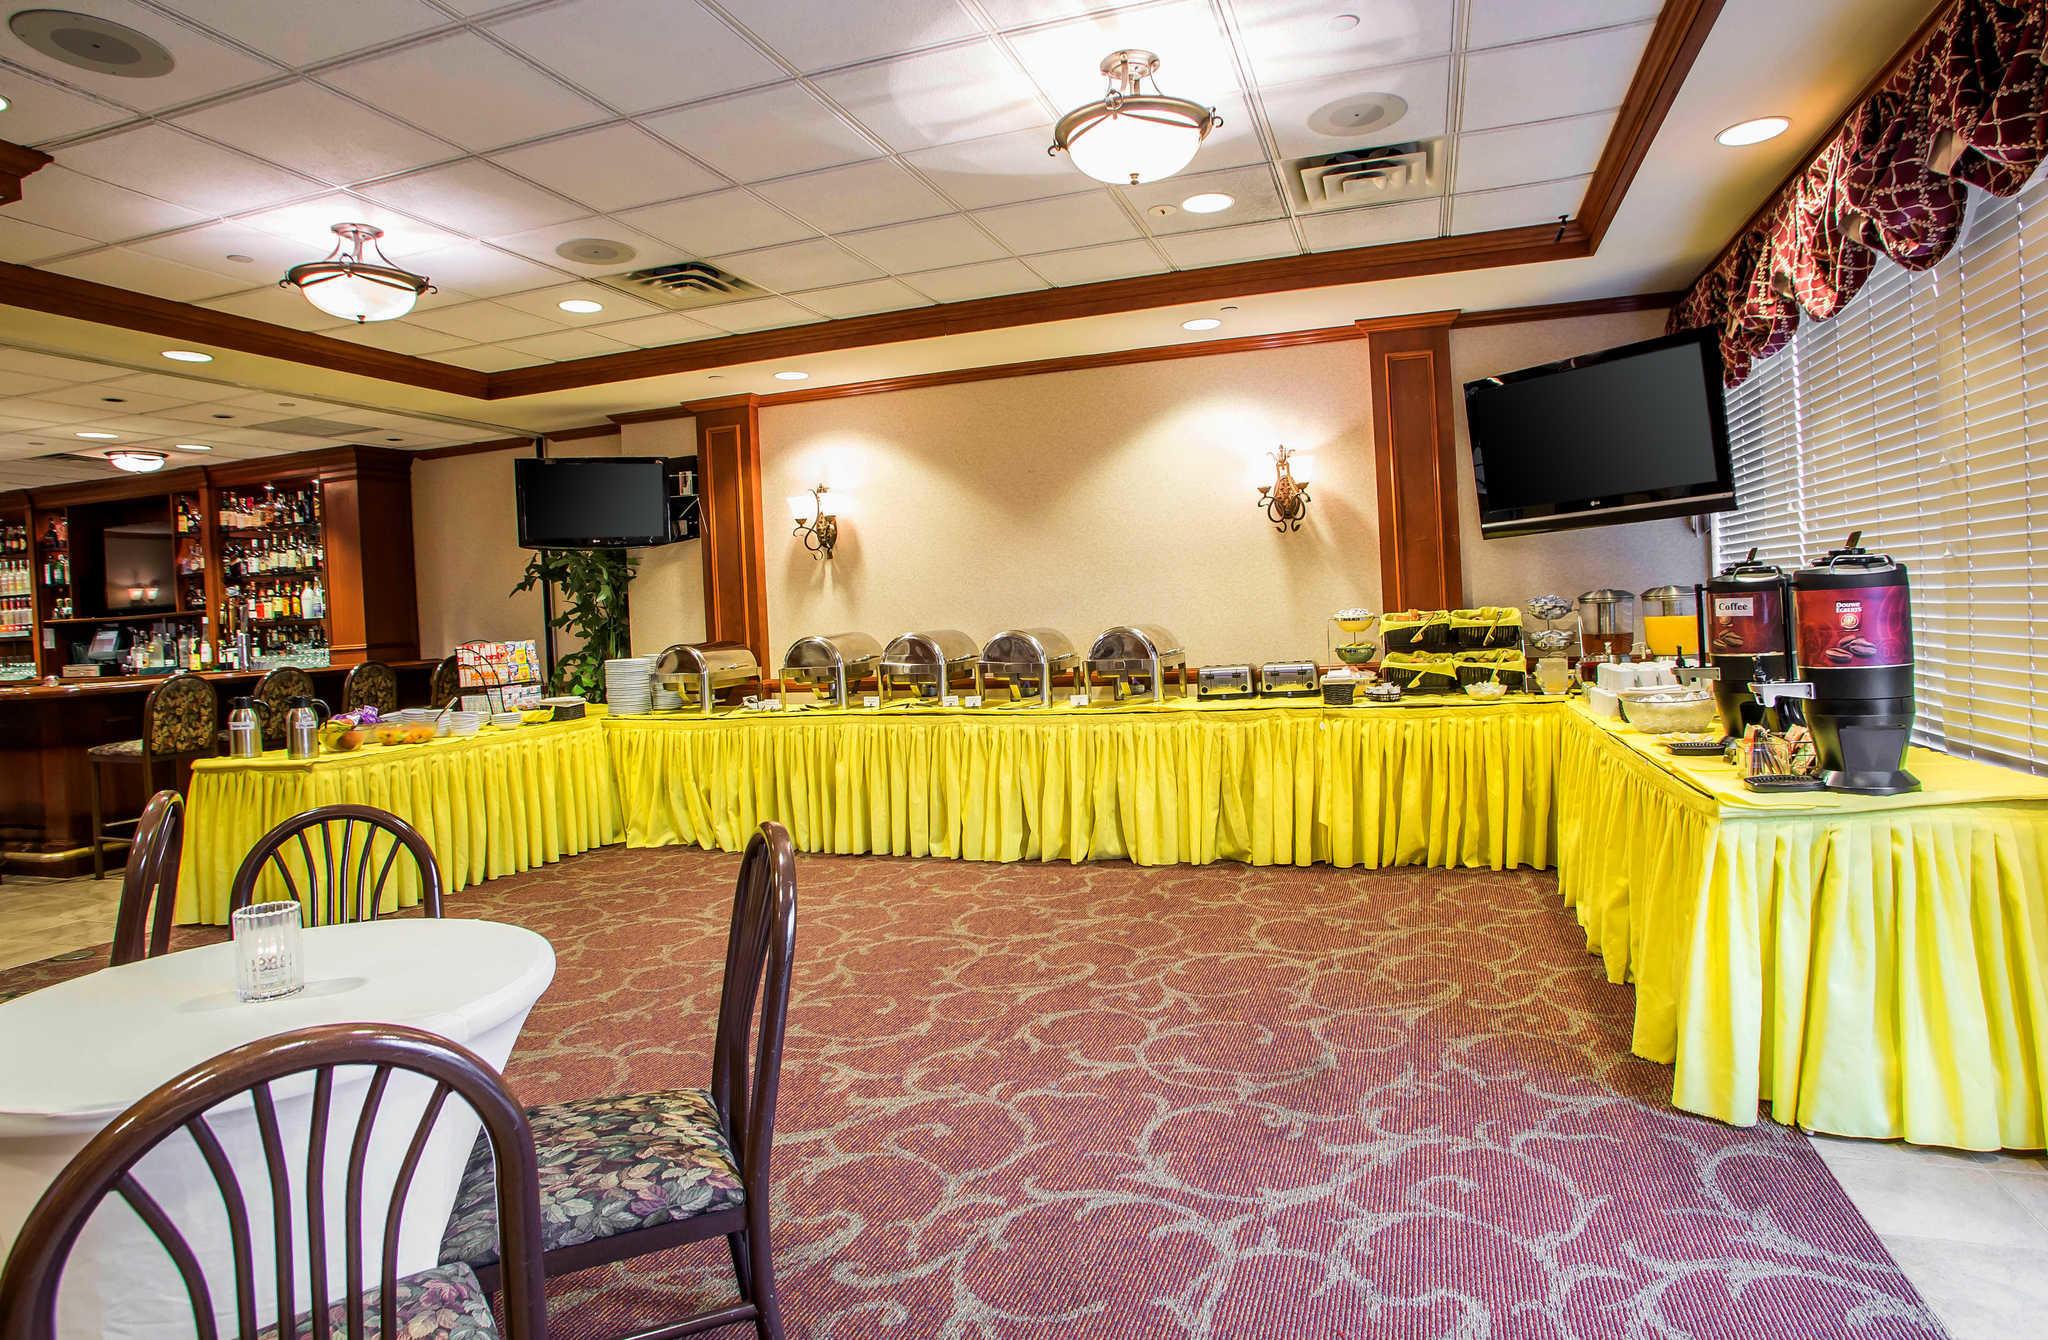 clarion hotel conference center toms river new jersey. Black Bedroom Furniture Sets. Home Design Ideas